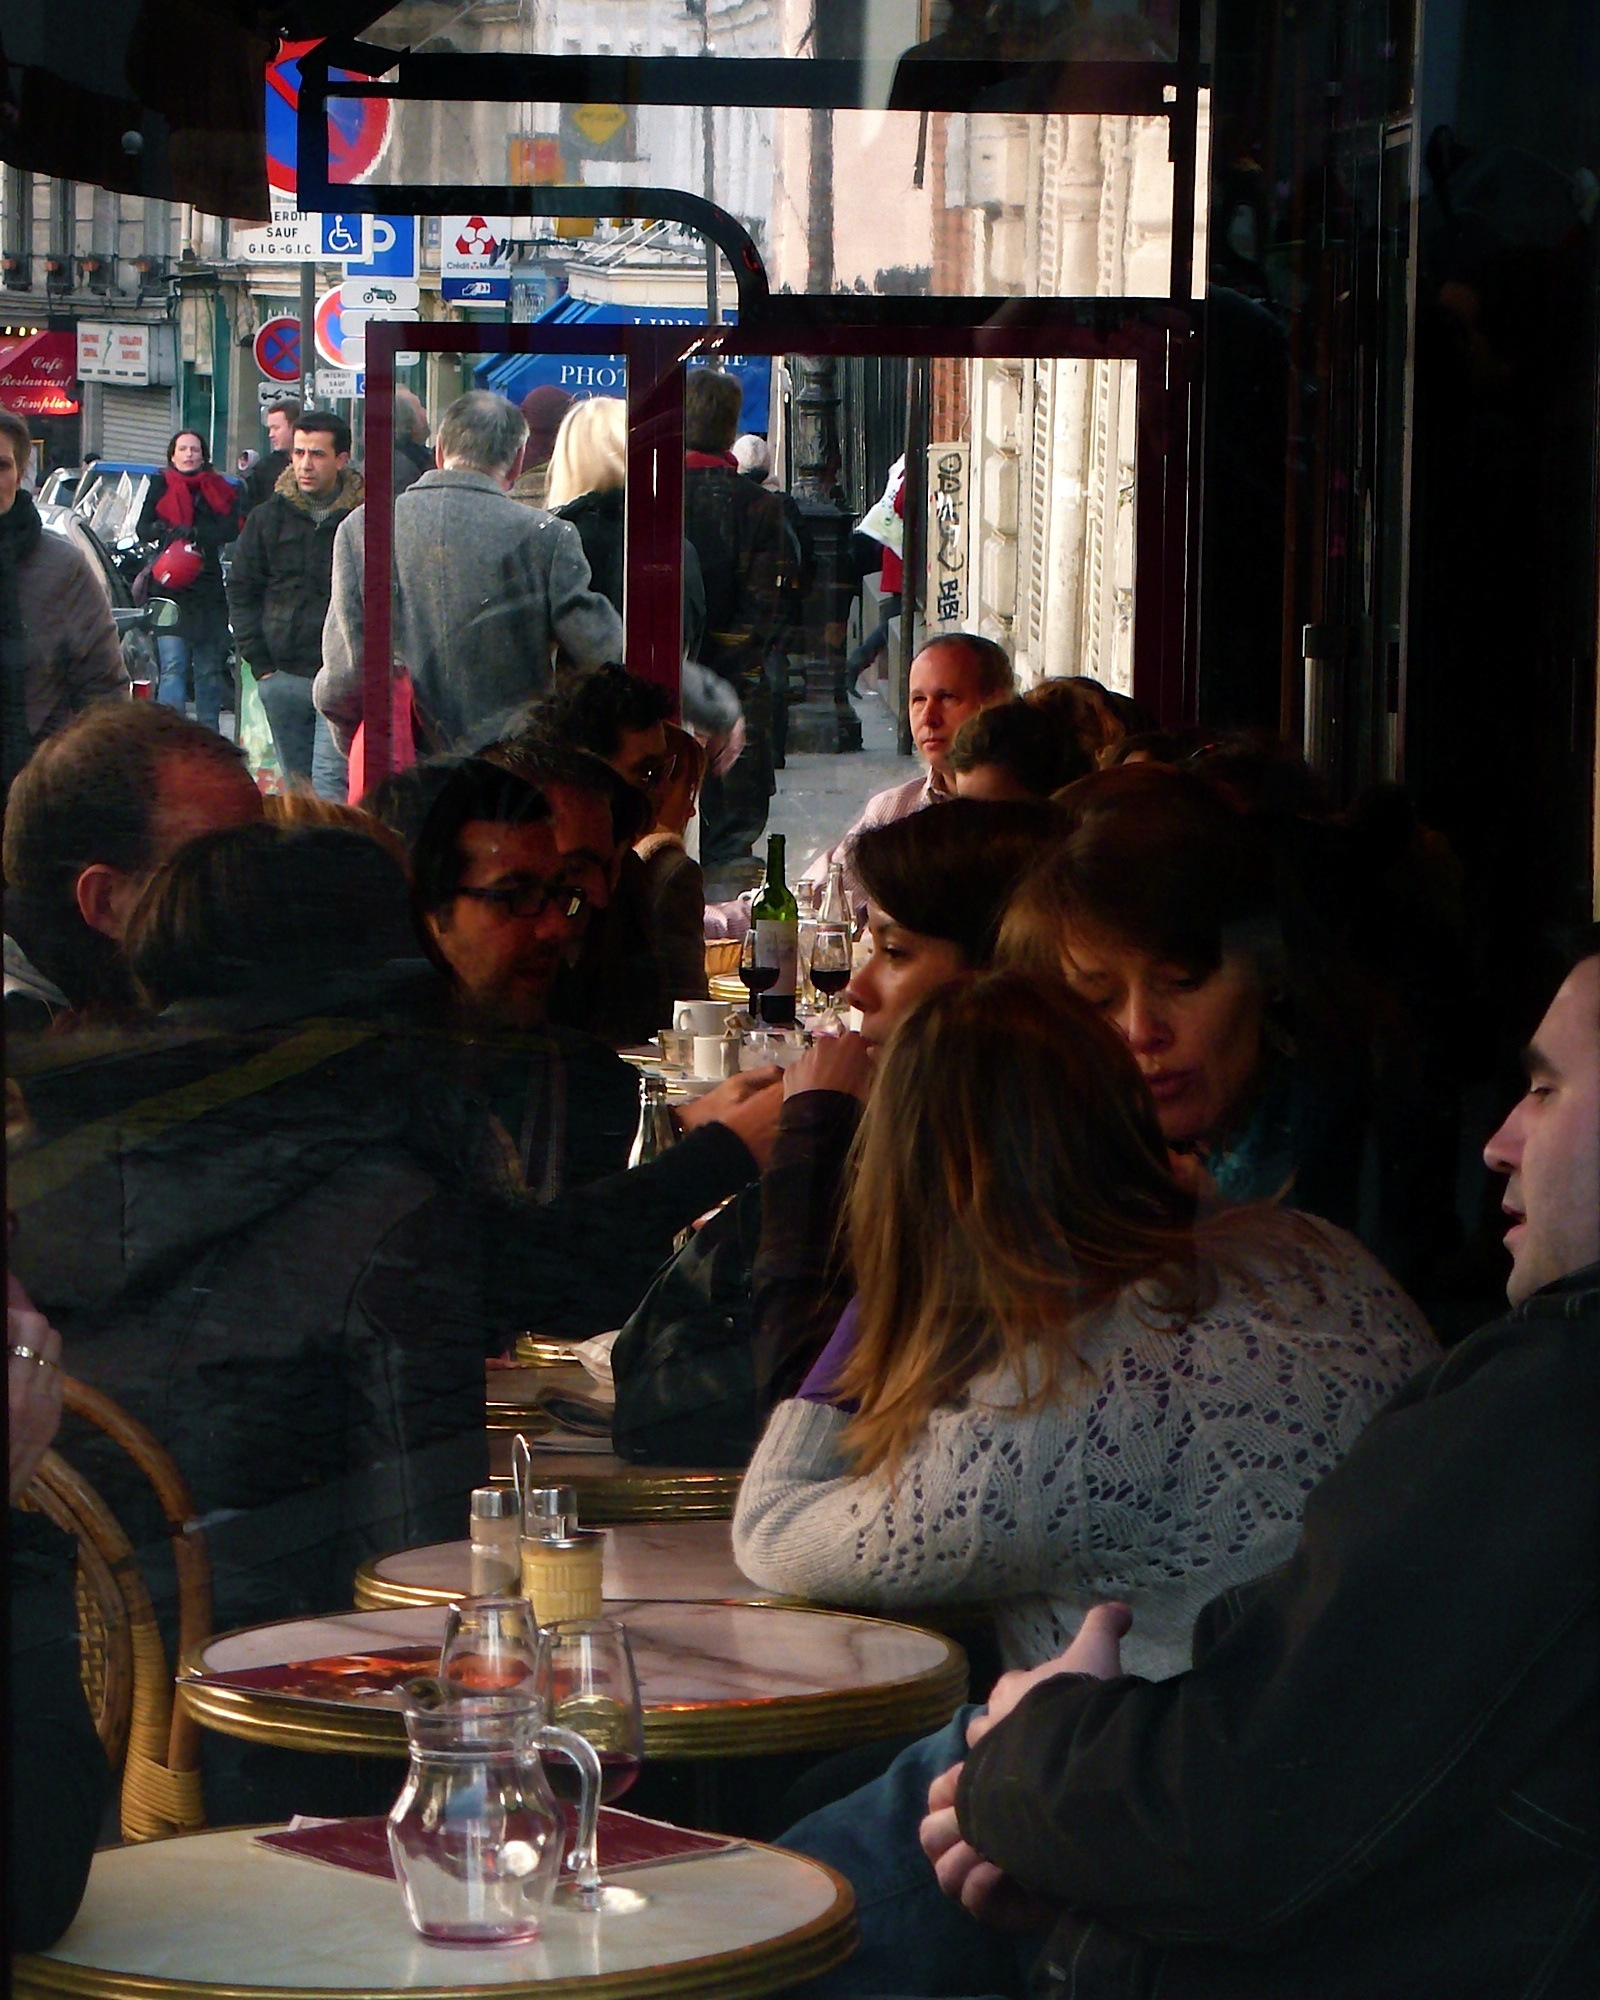 paris-cafe2-16x20-P1110544.jpg